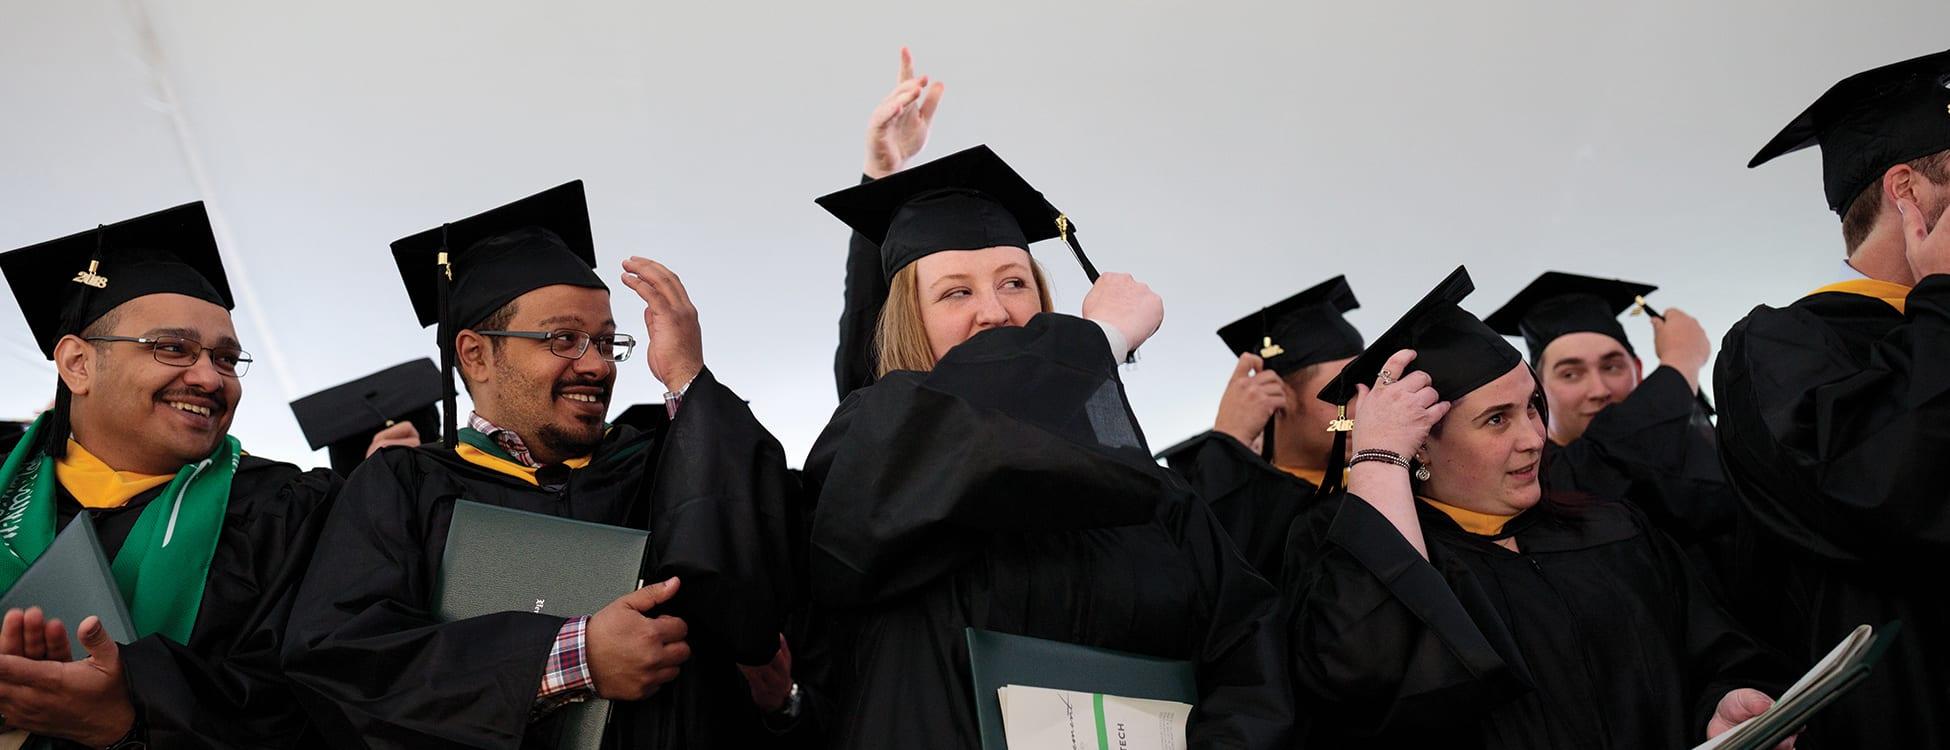 commencement, graduation, happy, congratulations